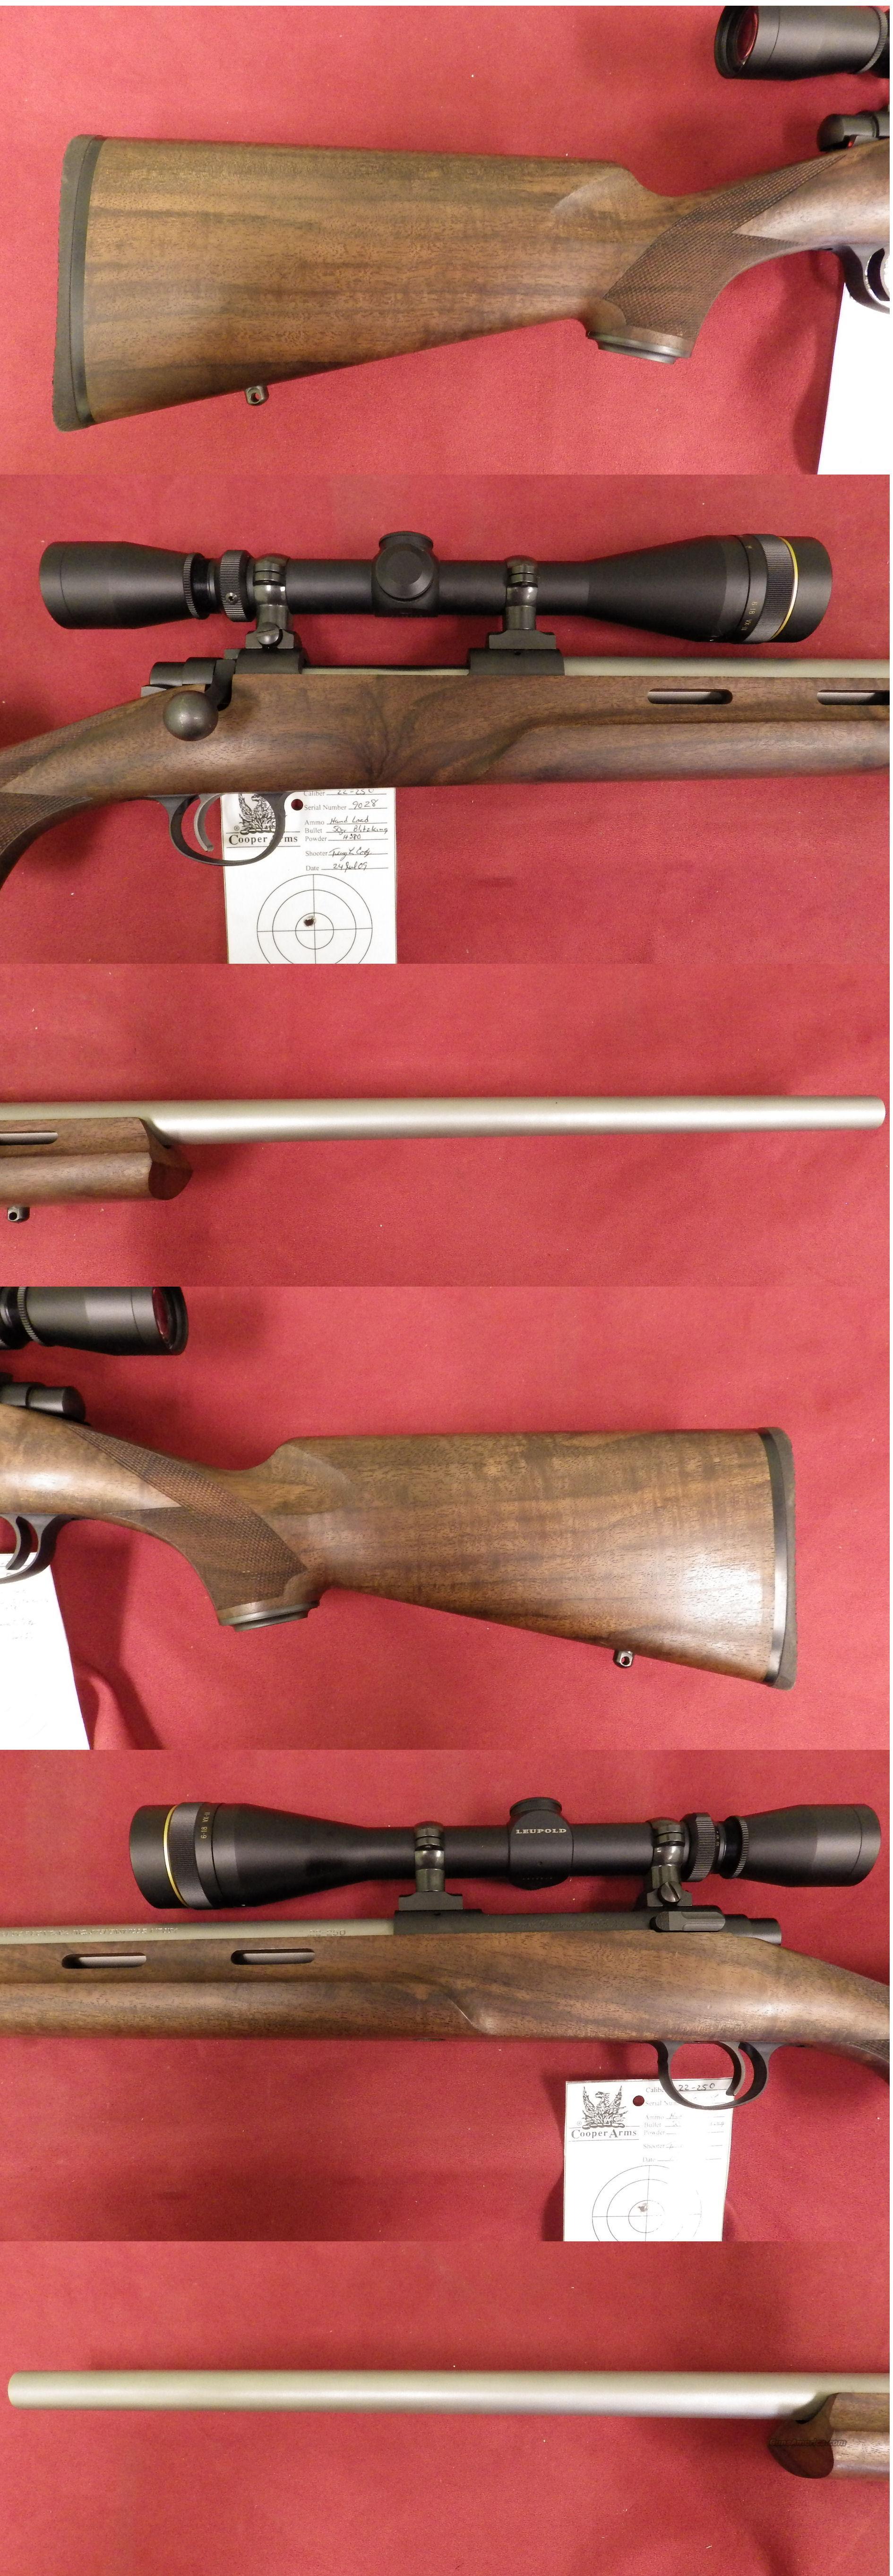 Cooper M22 22-250 Remington *MUST CALL*  Guns > Rifles > Cooper Arms Rifles